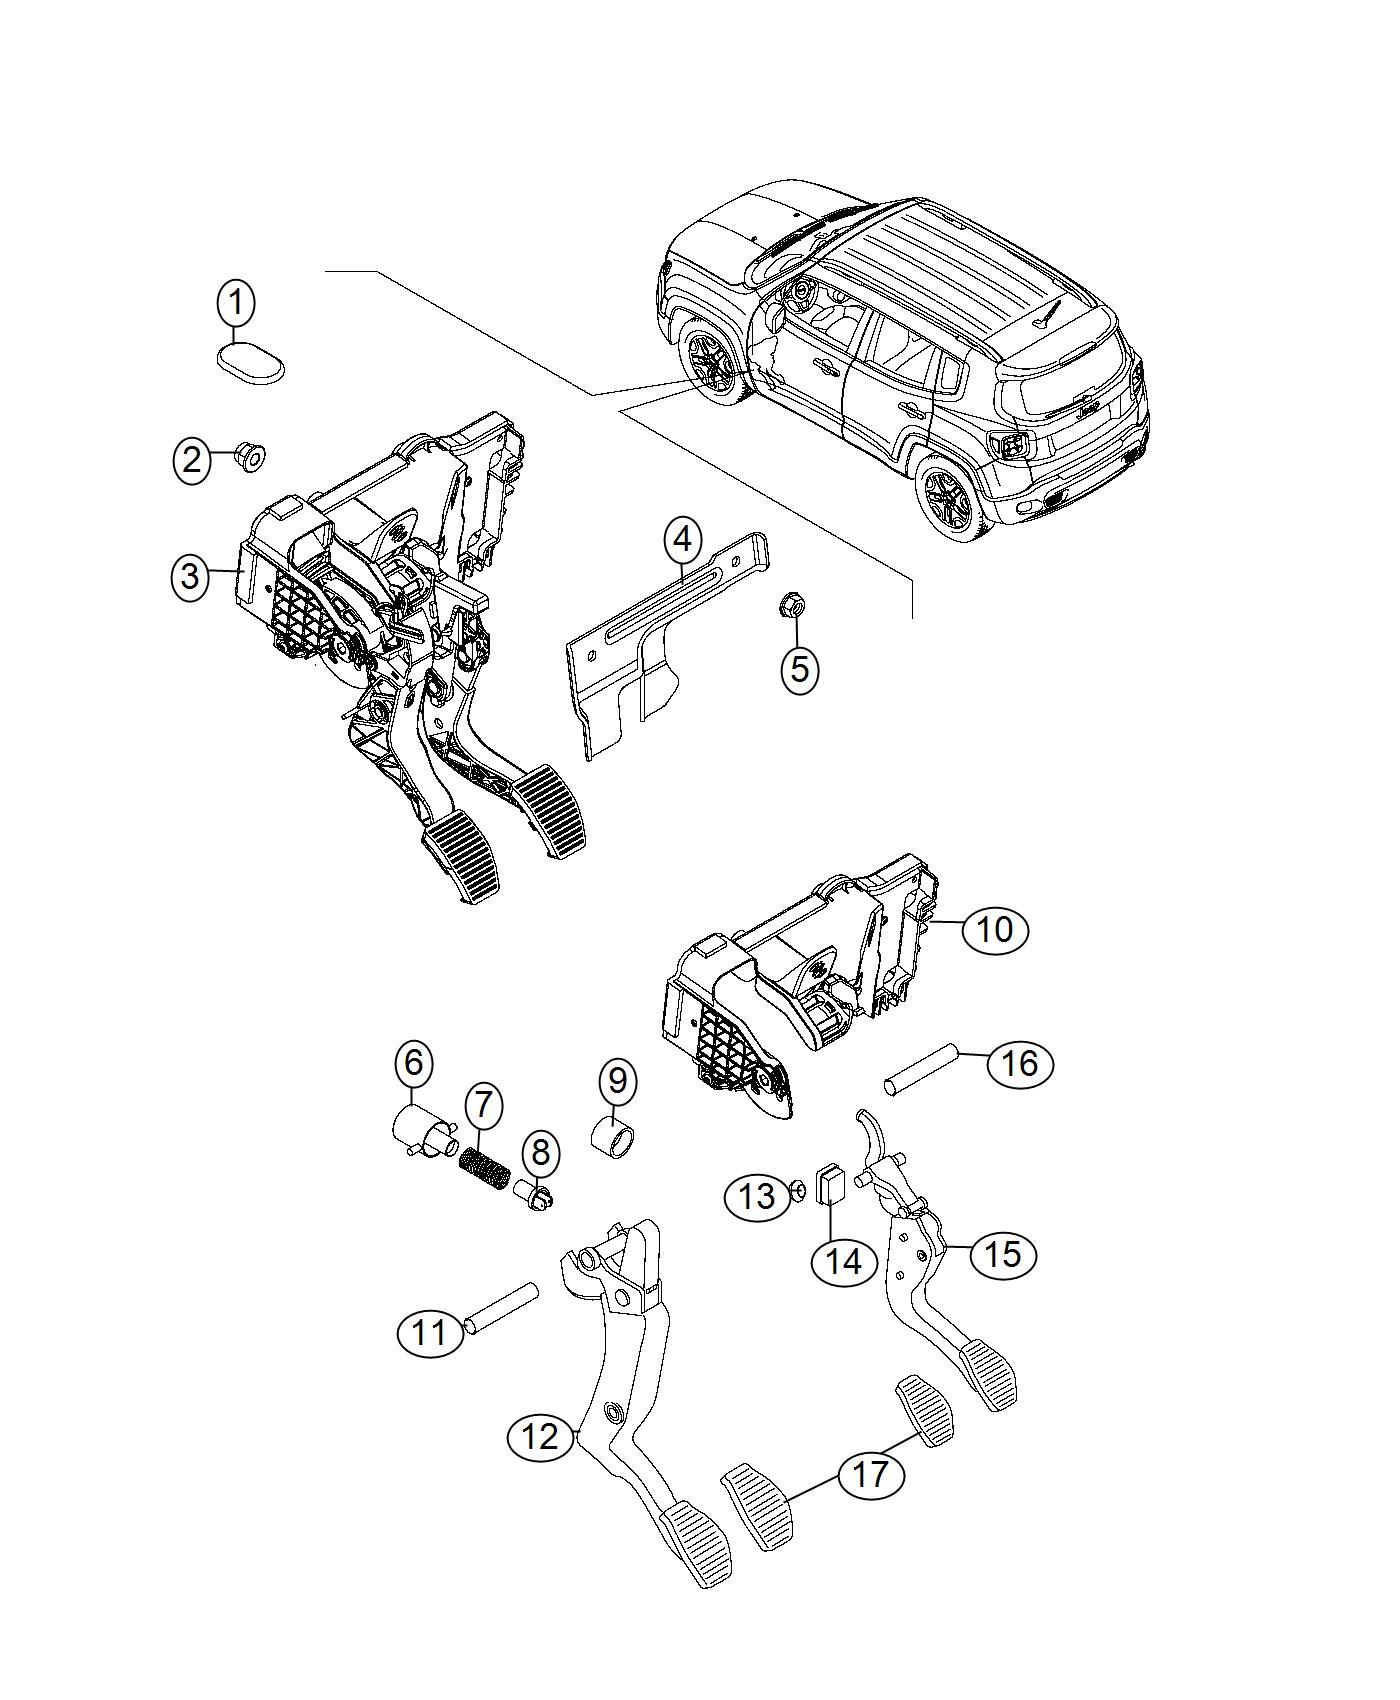 2016 Jeep Renegade Spring. Clutch pedal return. [passive